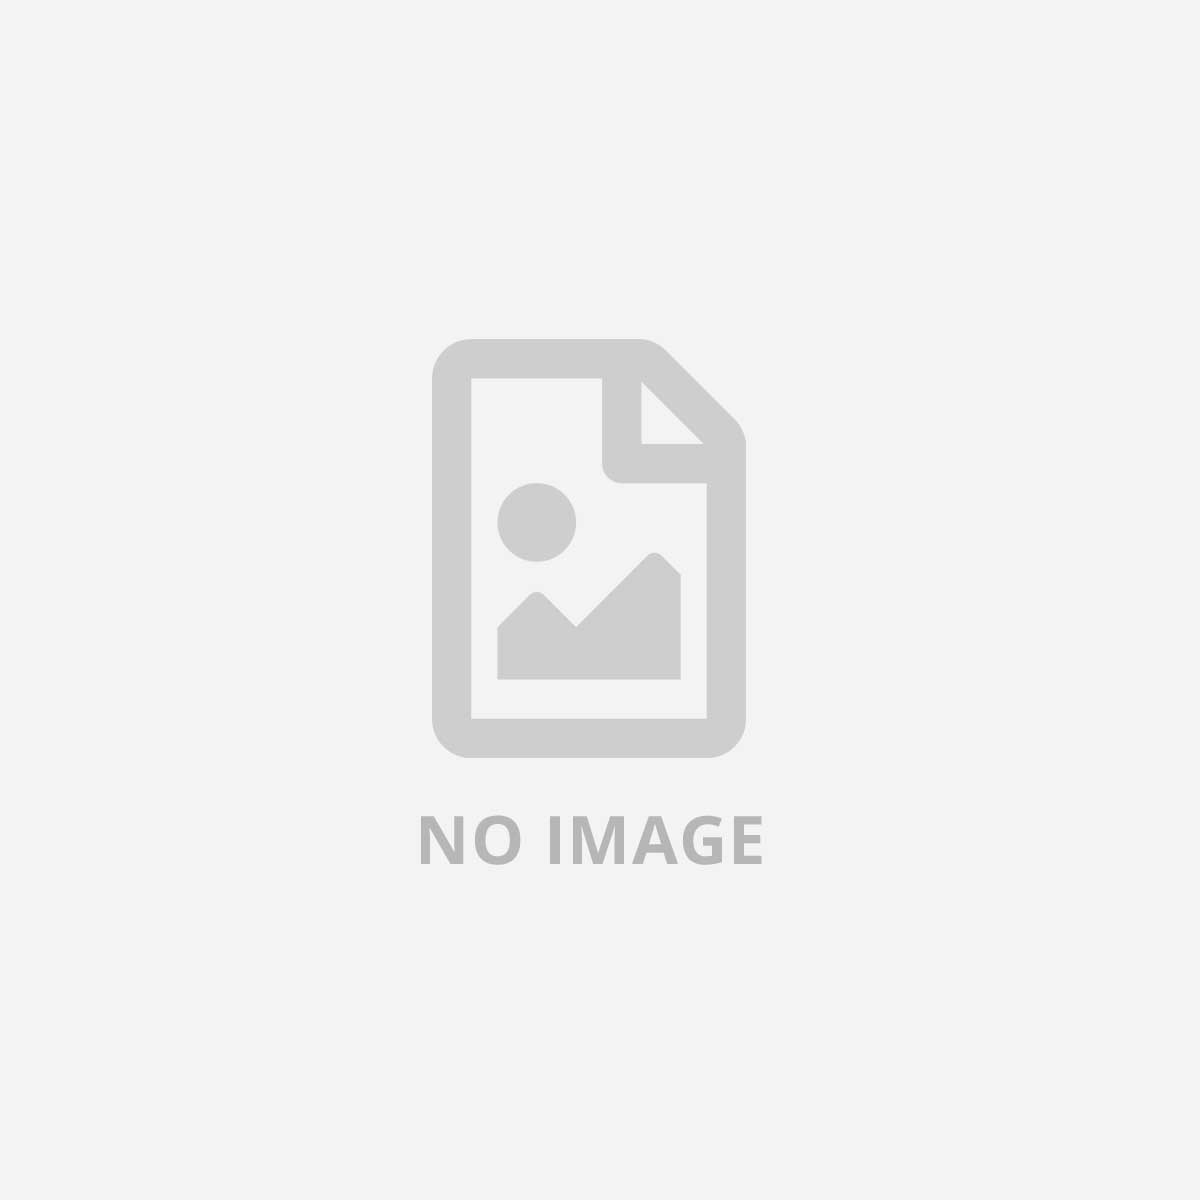 STARTECH SCHEDA AUDIO STEREO USB